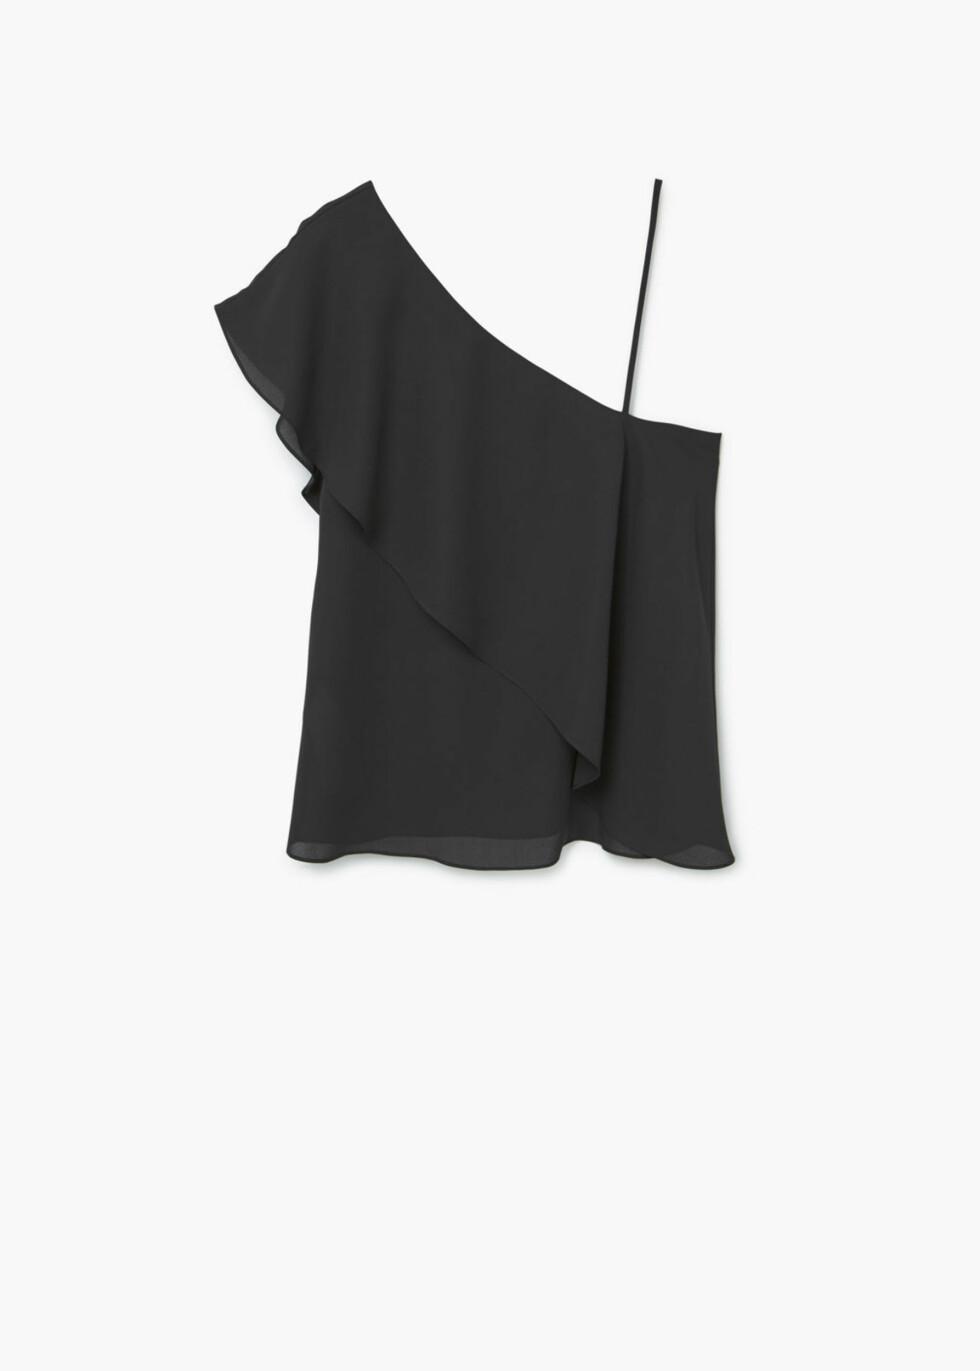 <strong>Topp fra Mango   kr 349   http:</strong>//shop.mango.com/NO/p1/damer/kl%C3%A6r/skjorter/bluser/topp-med-asymmetrisk-design?id=73089015_99&n=1&s=nuevo&ts=1478101469543